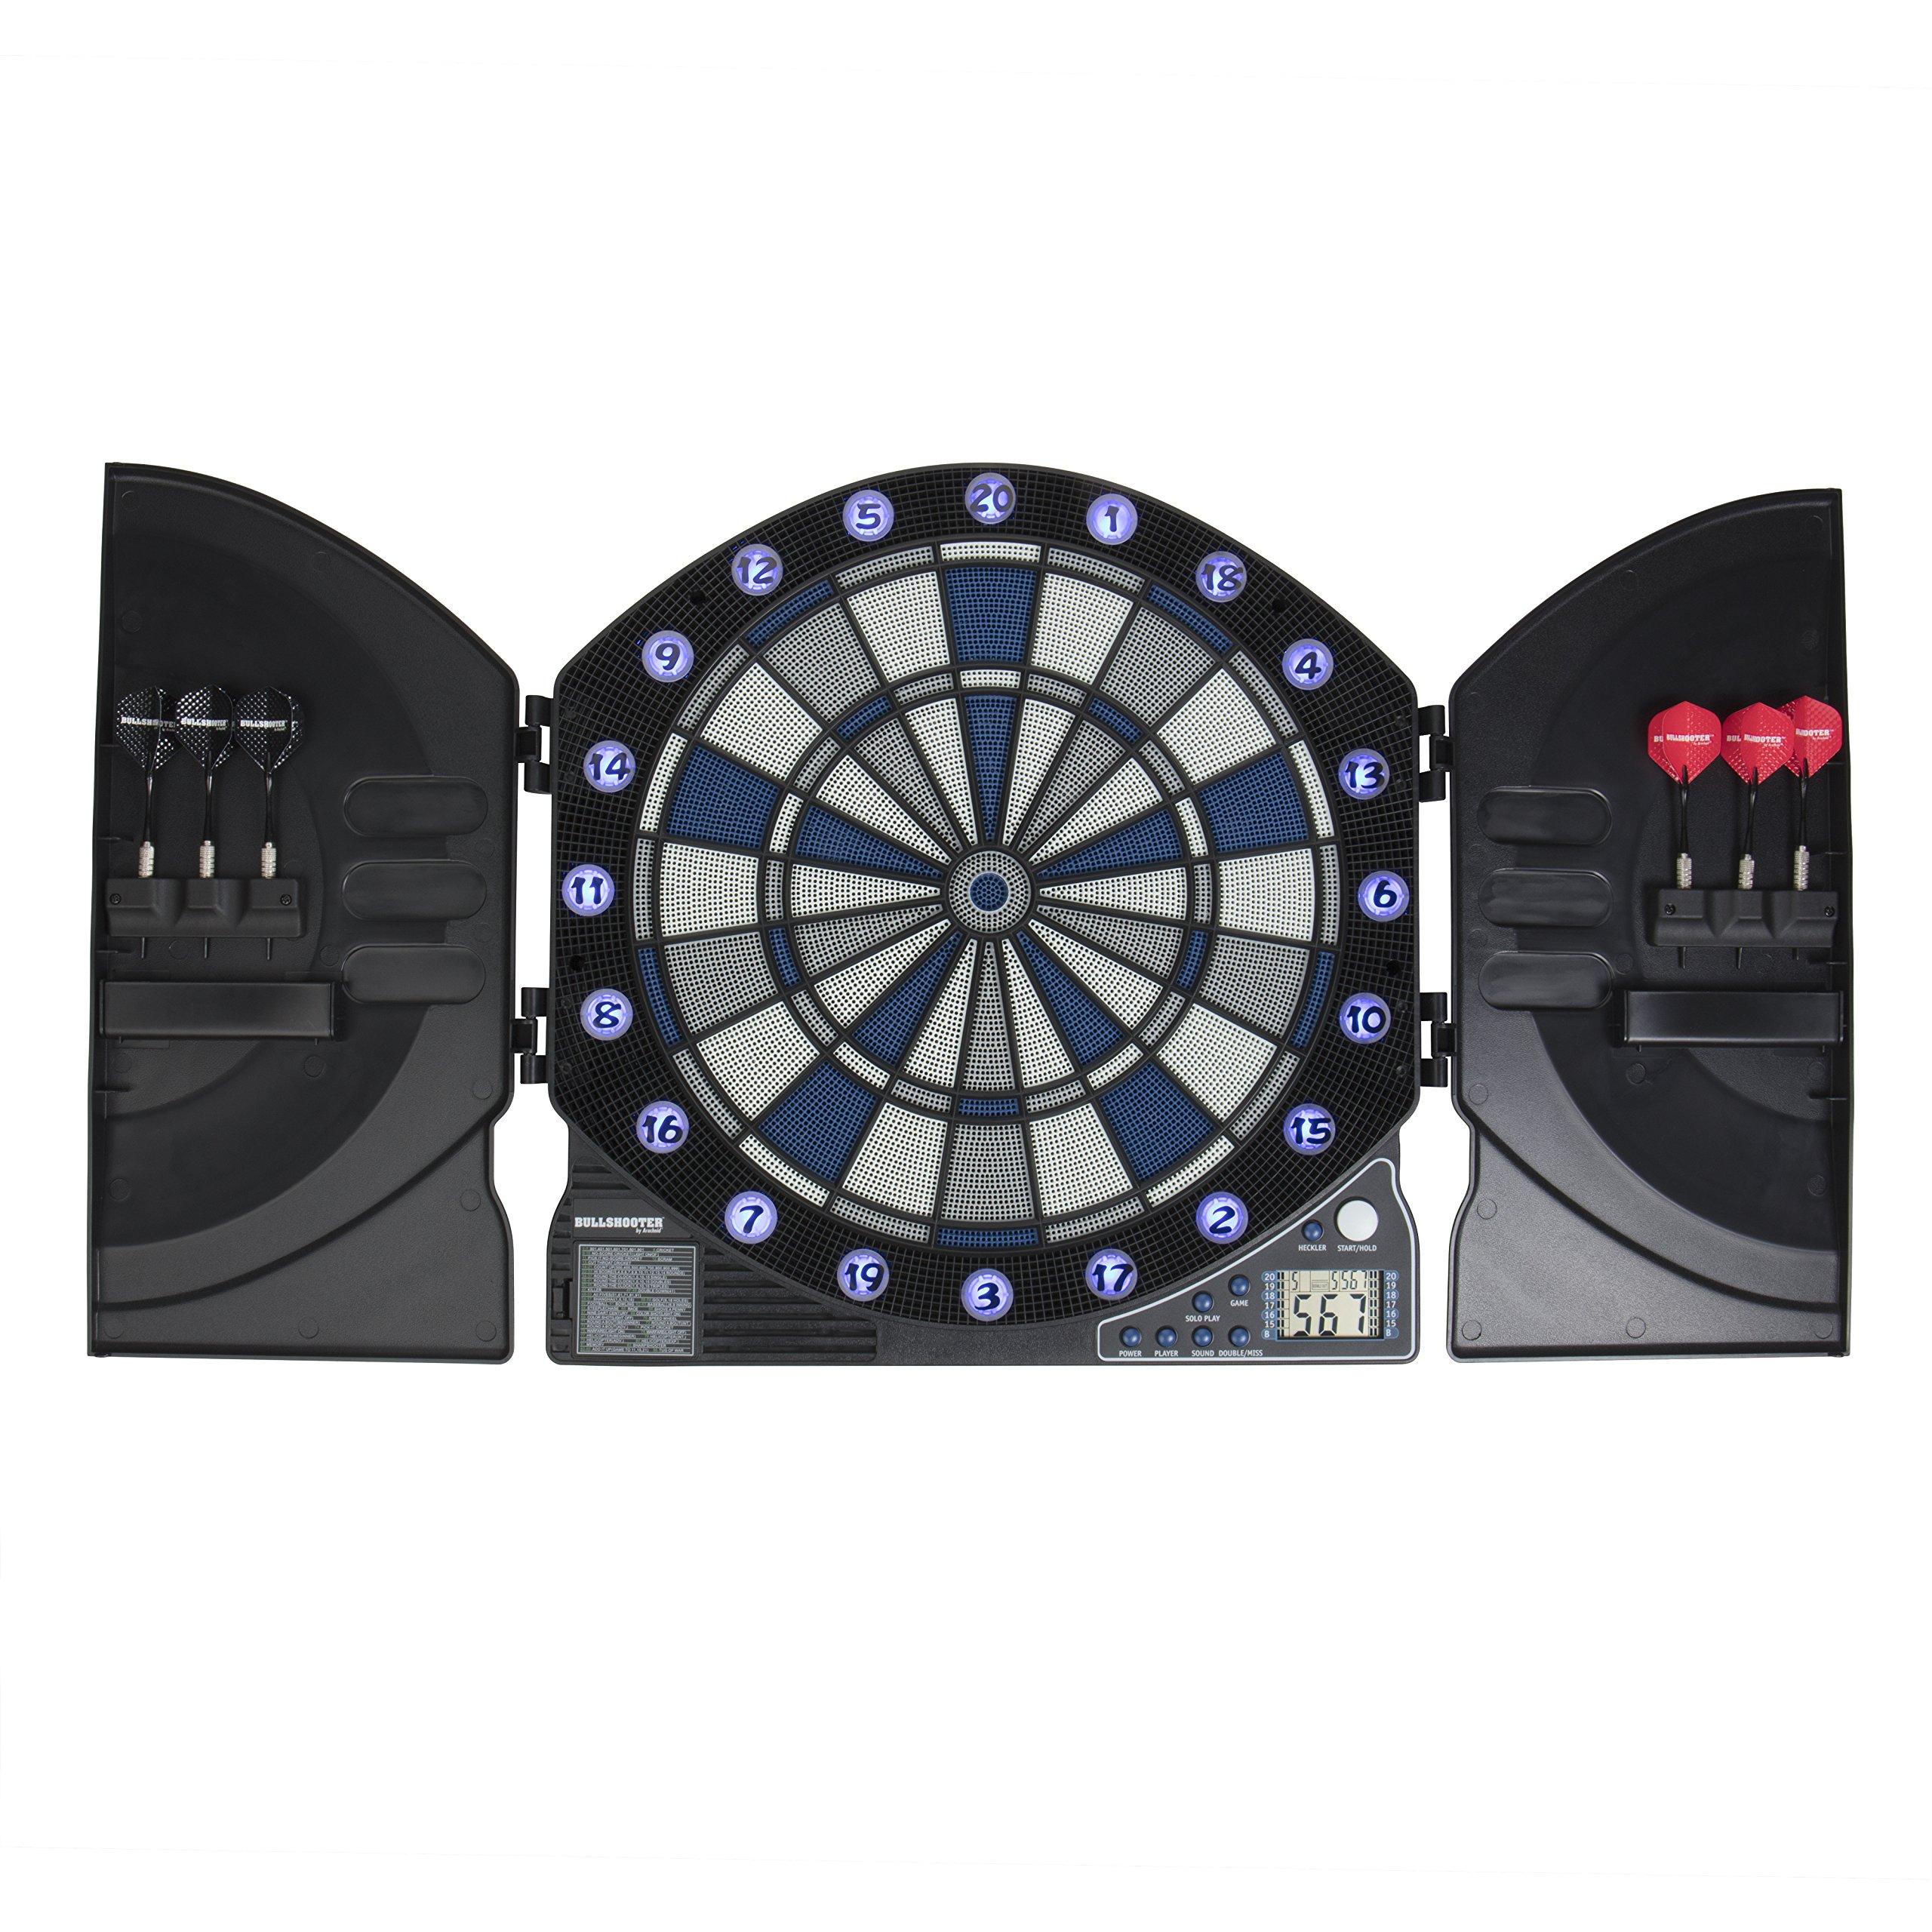 Arachnid Bullshooter by Illuminator 3.0 Electronic Dartboard and Cabinet with 13 LED Light Up Games